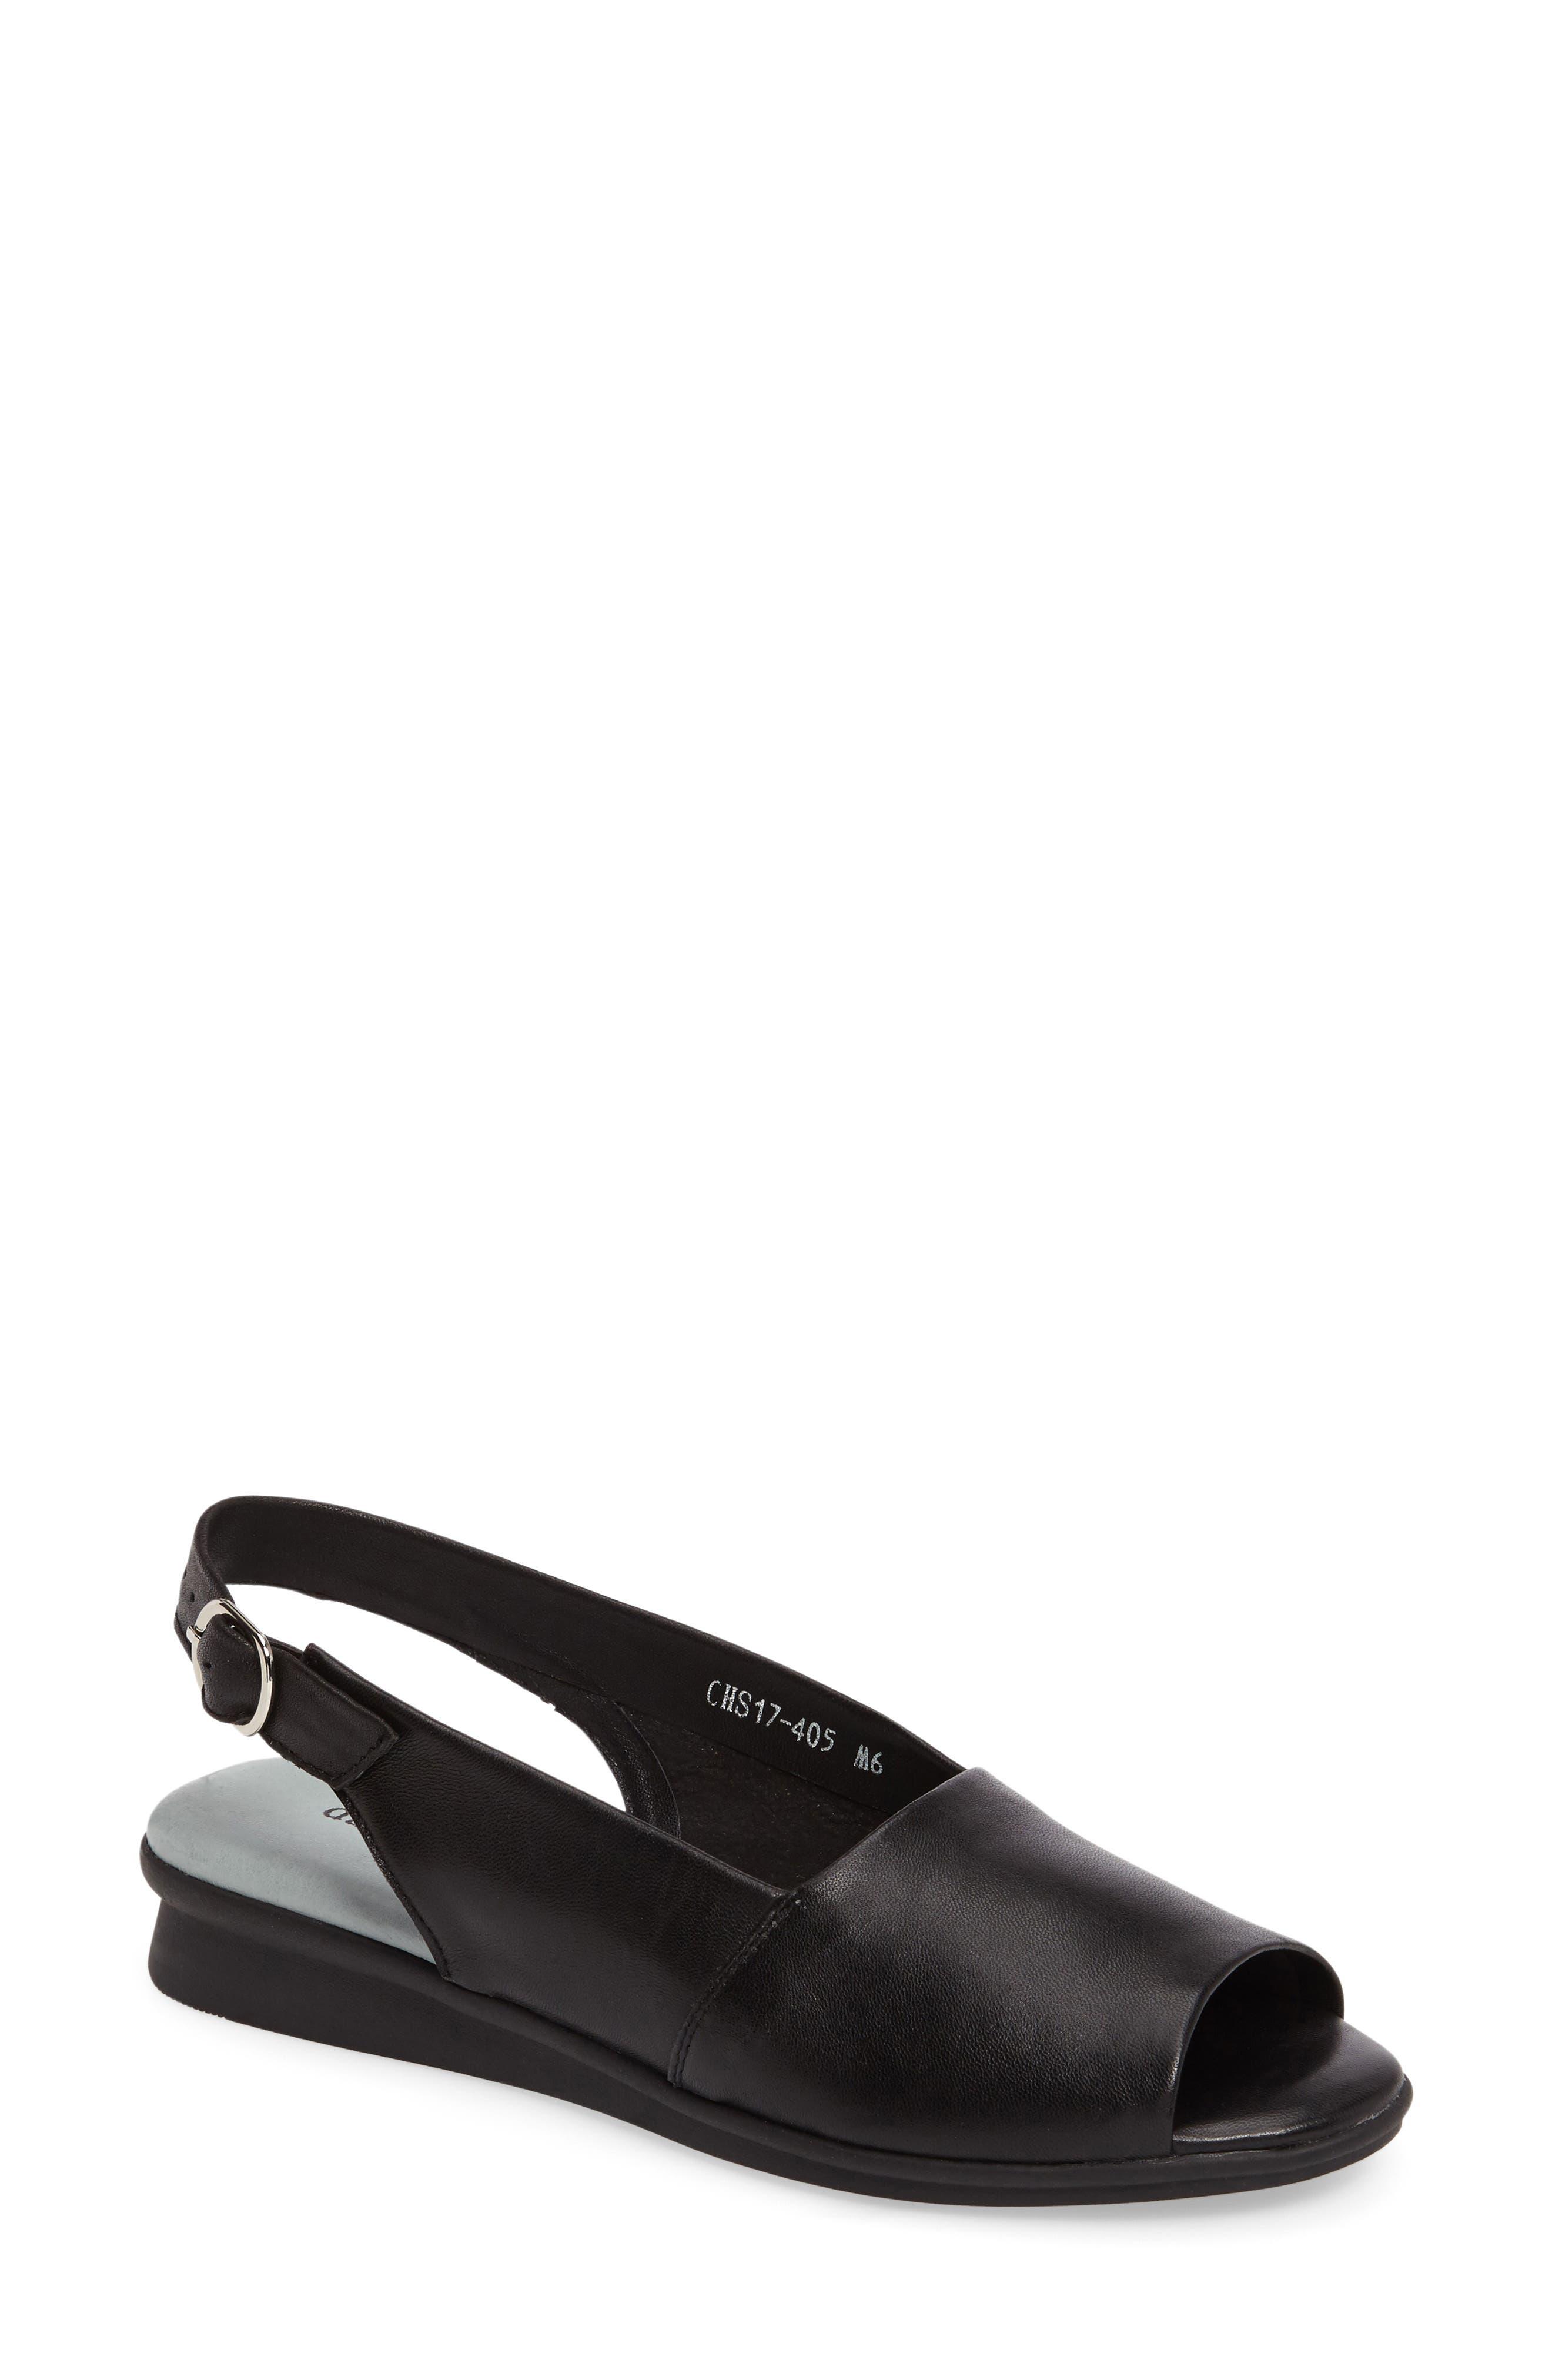 Norma Slingback Sandal, Main, color, BLACK LEATHER